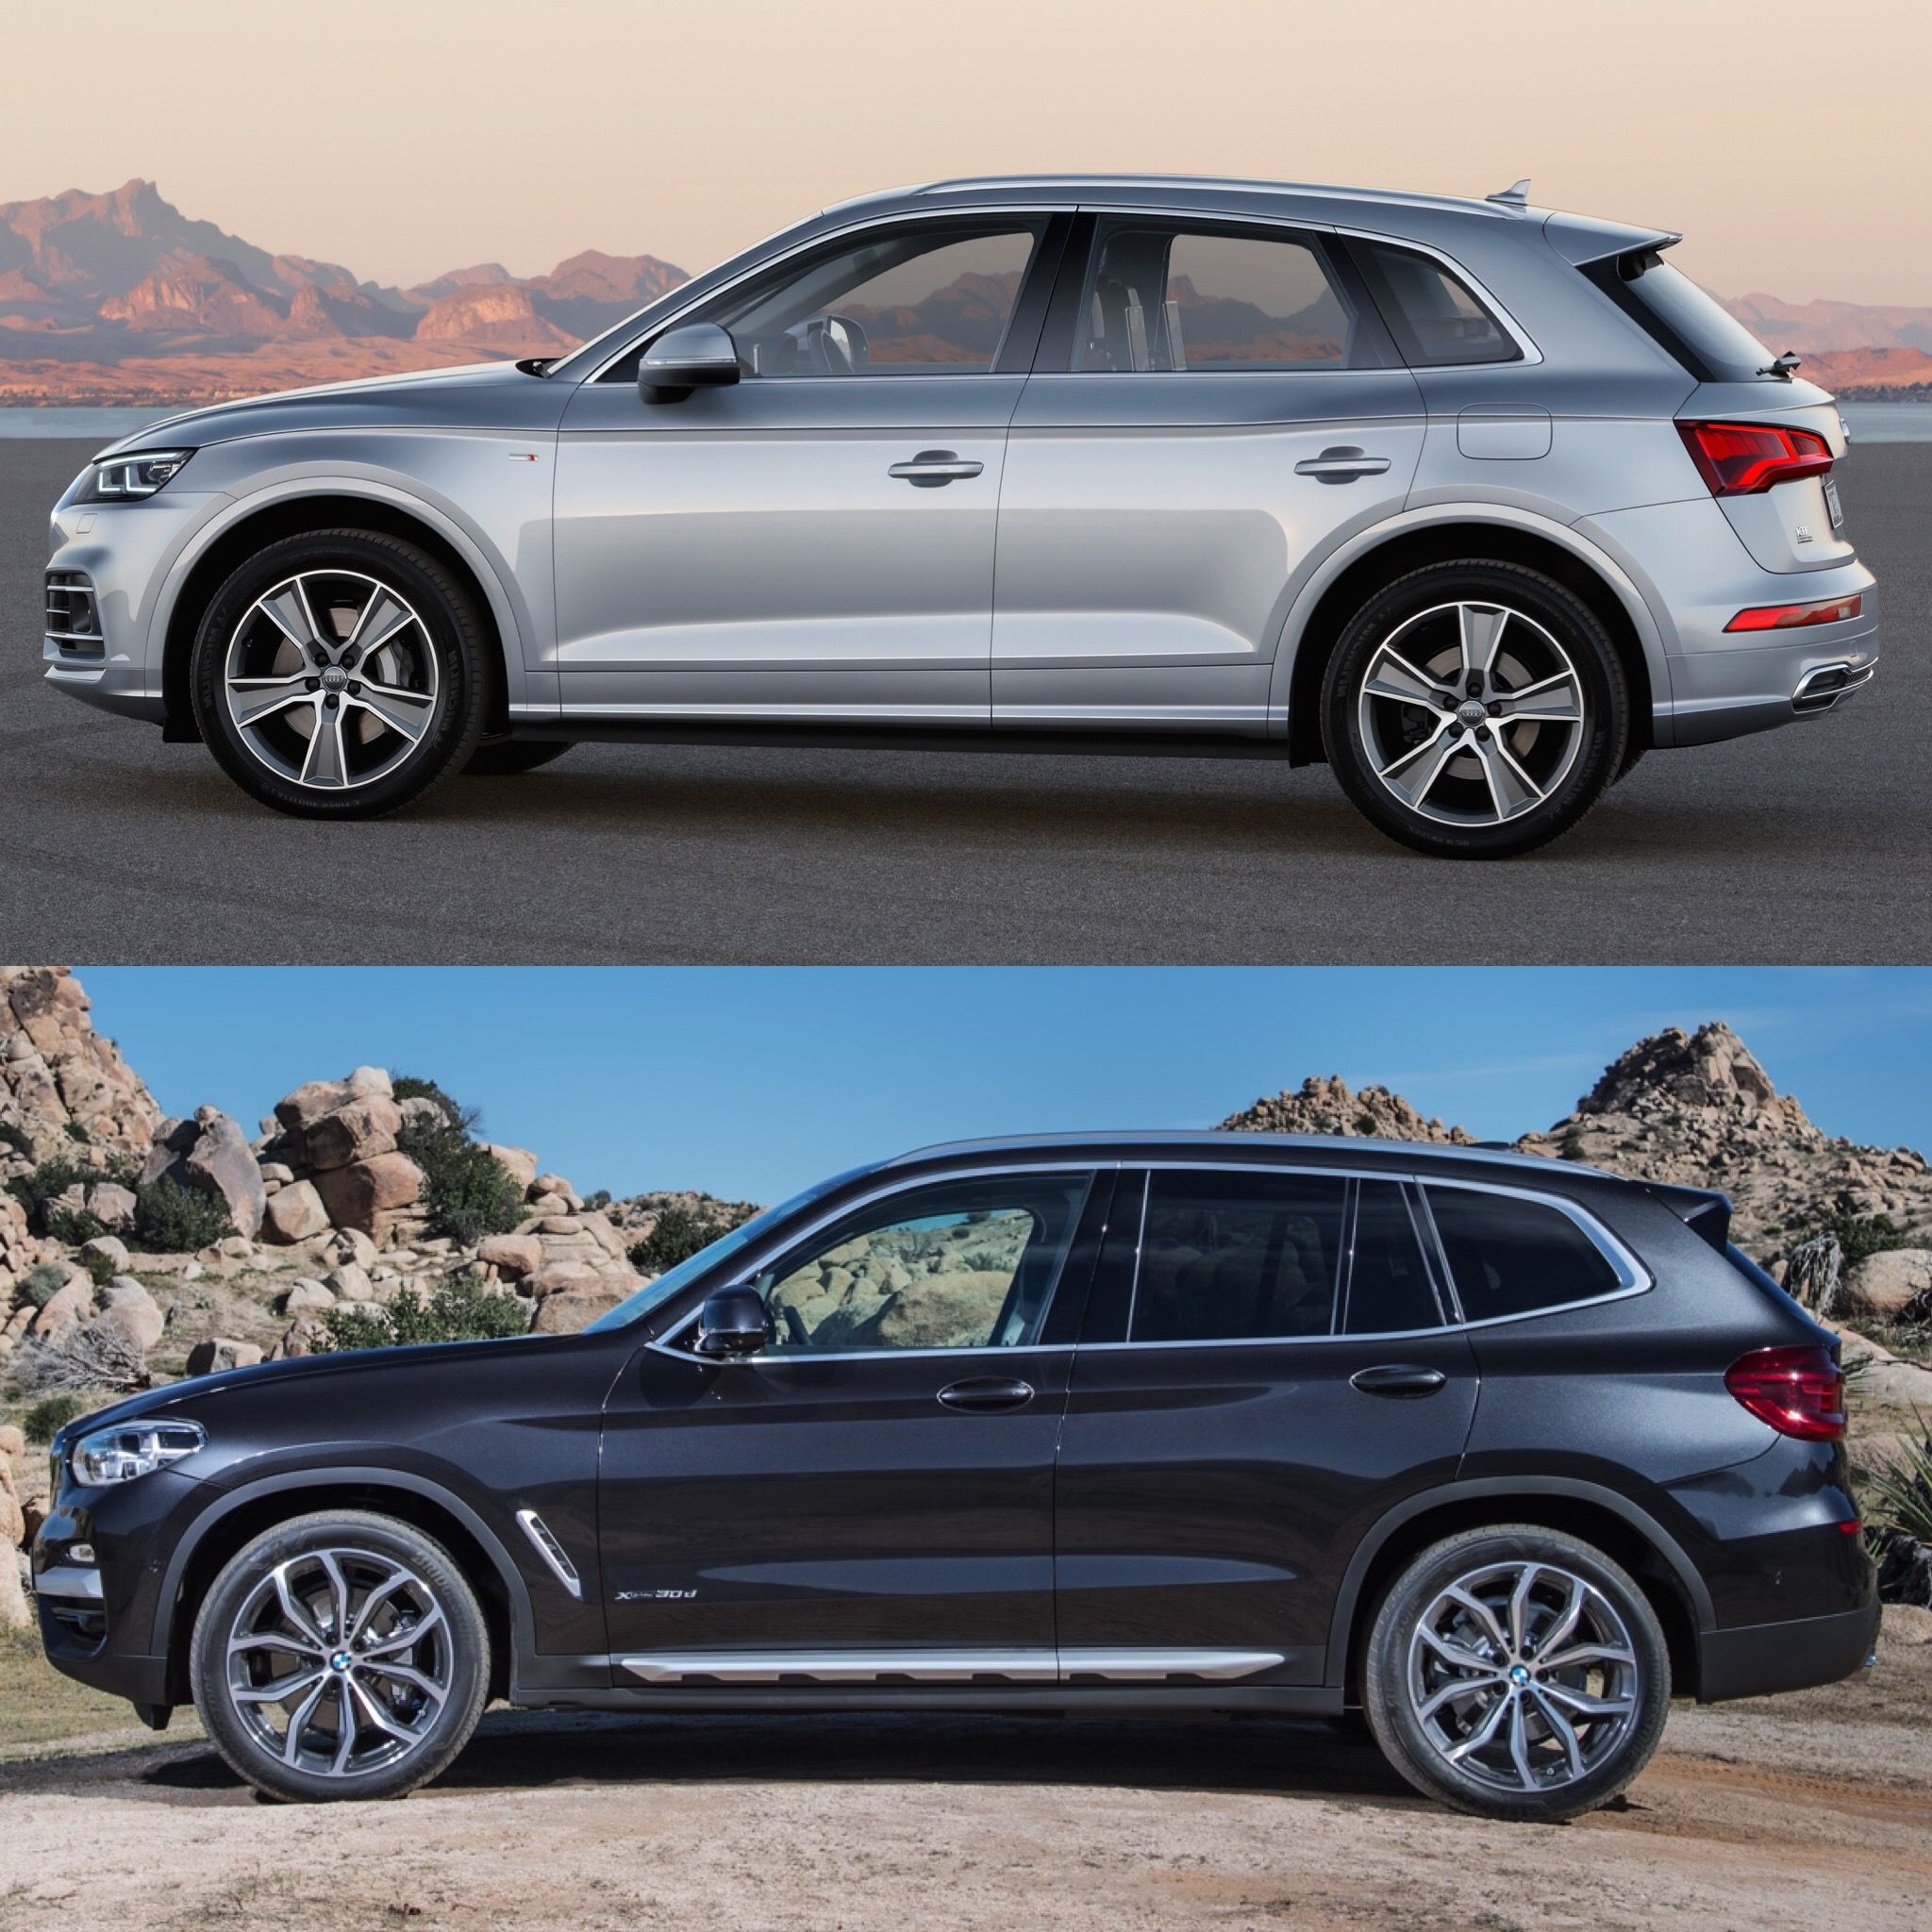 Photo Comparison G01 Bmw X3 Xdrive30ivs Audi Q5 2 0t Bmw X3 Bmw Bmw Models